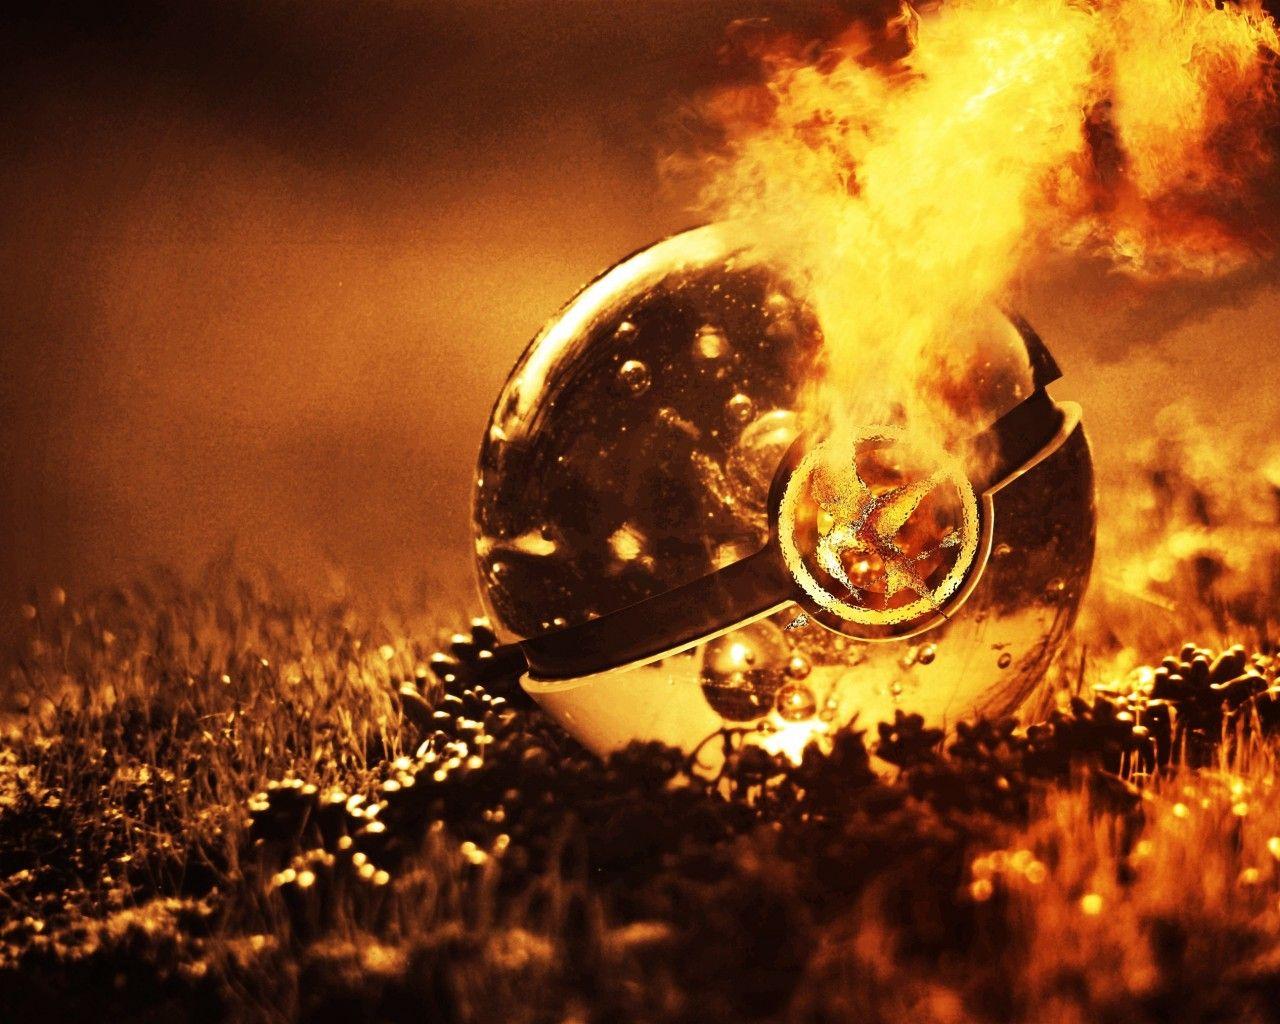 Pokemon Fire Balls 3D Art Change Games Entertainment Video 1280x1024